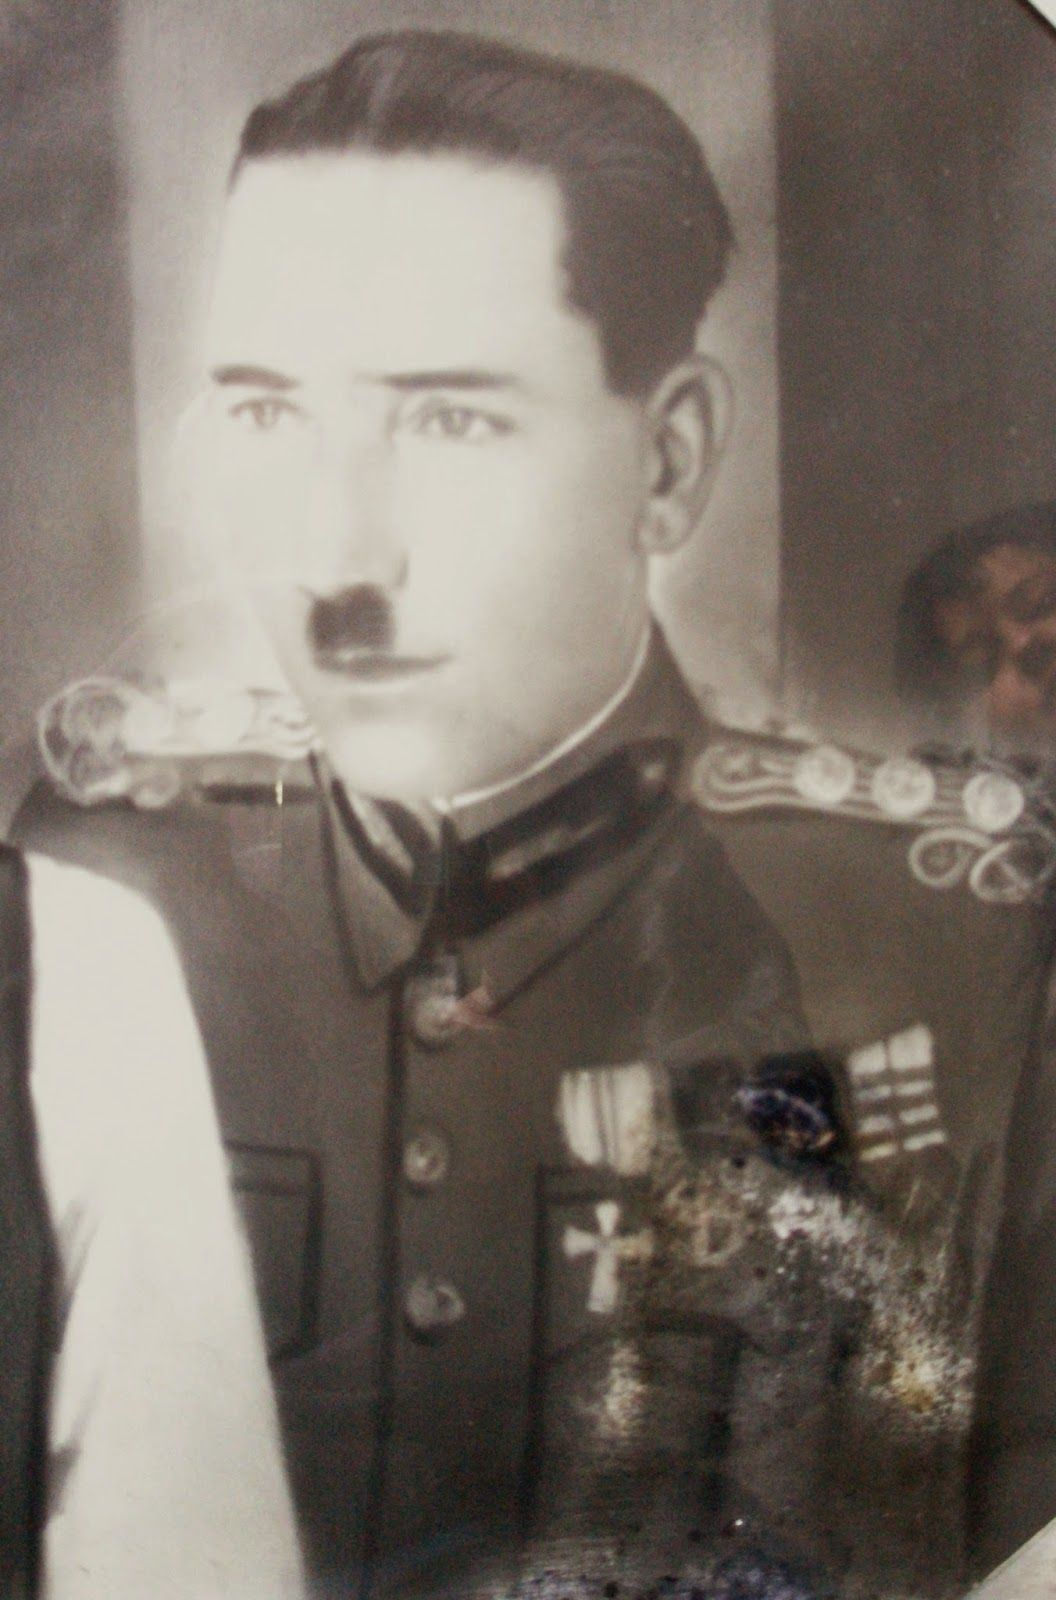 MOXOΣ...Μανώλης ΓΙΑΚΟΥΜΑΚΗΣ..[ Ταγματάρχης Πεζικού…Αγωνιστής της Εθνικής Αντίστασης στην Κρήτη, κατά των Γερμανών..]...Εκτελέστηκε απο τους Γερμανούς στις 27 Οκτωβρίου 1943.....